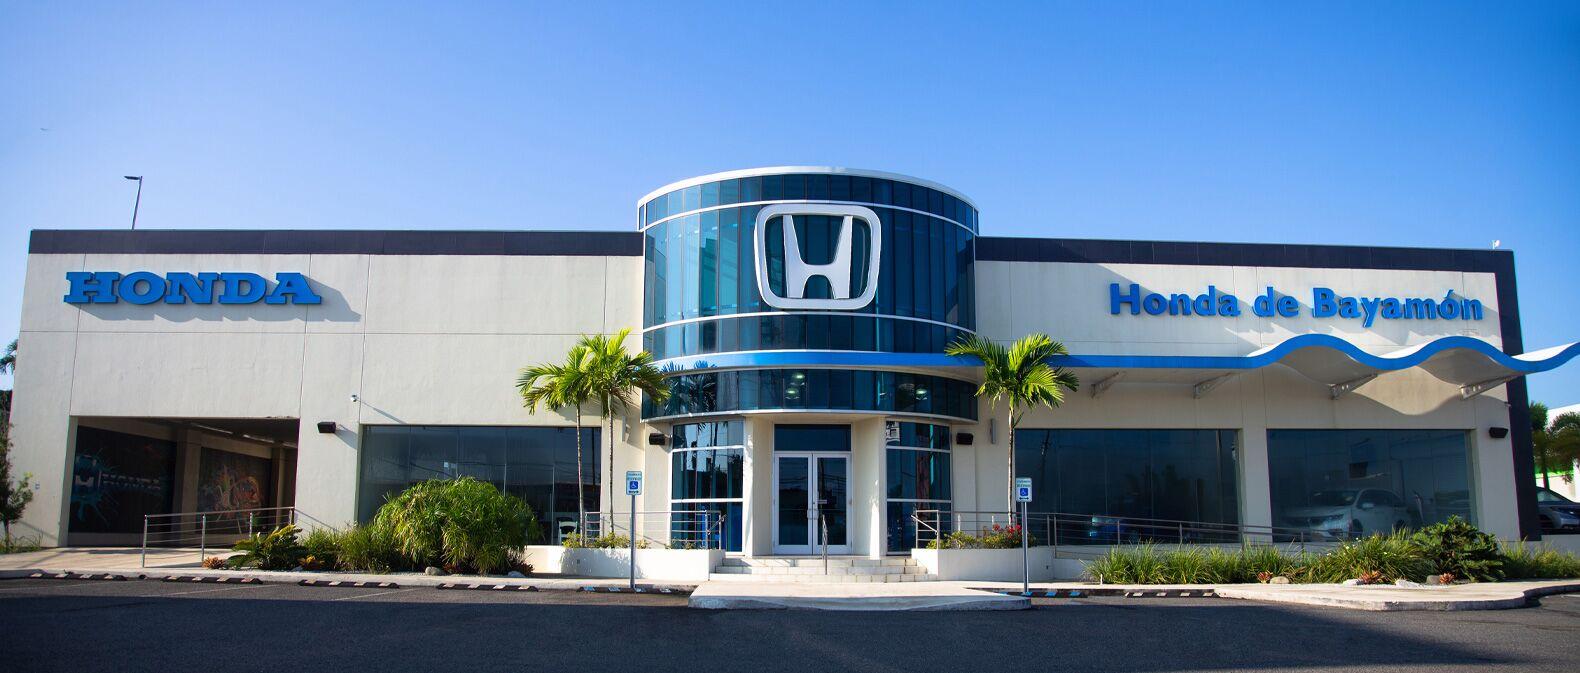 Honda de Bayamón Dealership